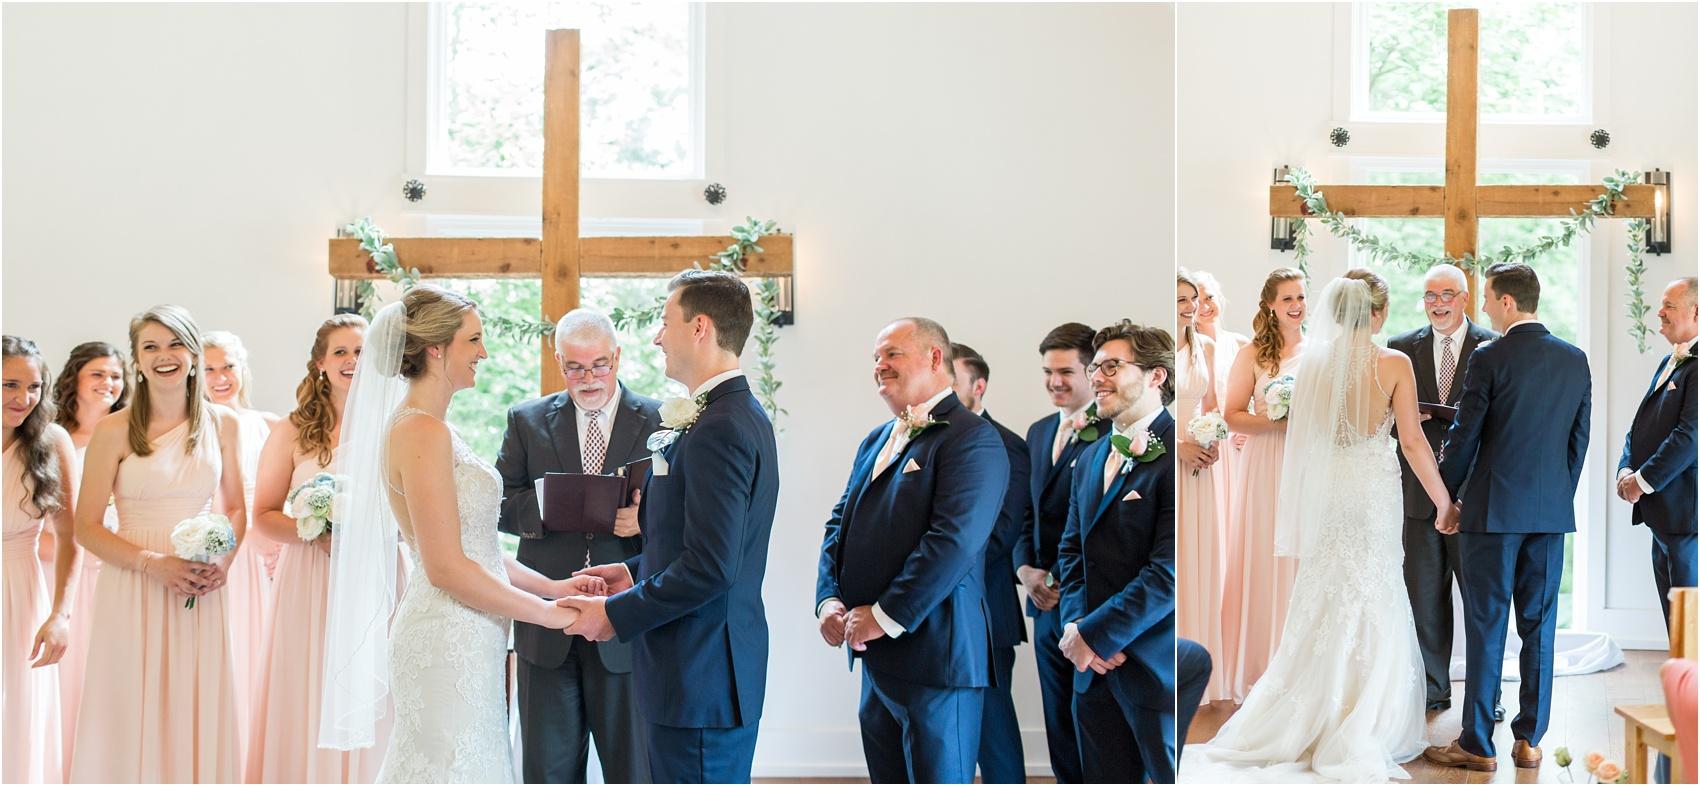 Savannah Eve Photography- Roper-Powell Wedding- Blog-31.jpg